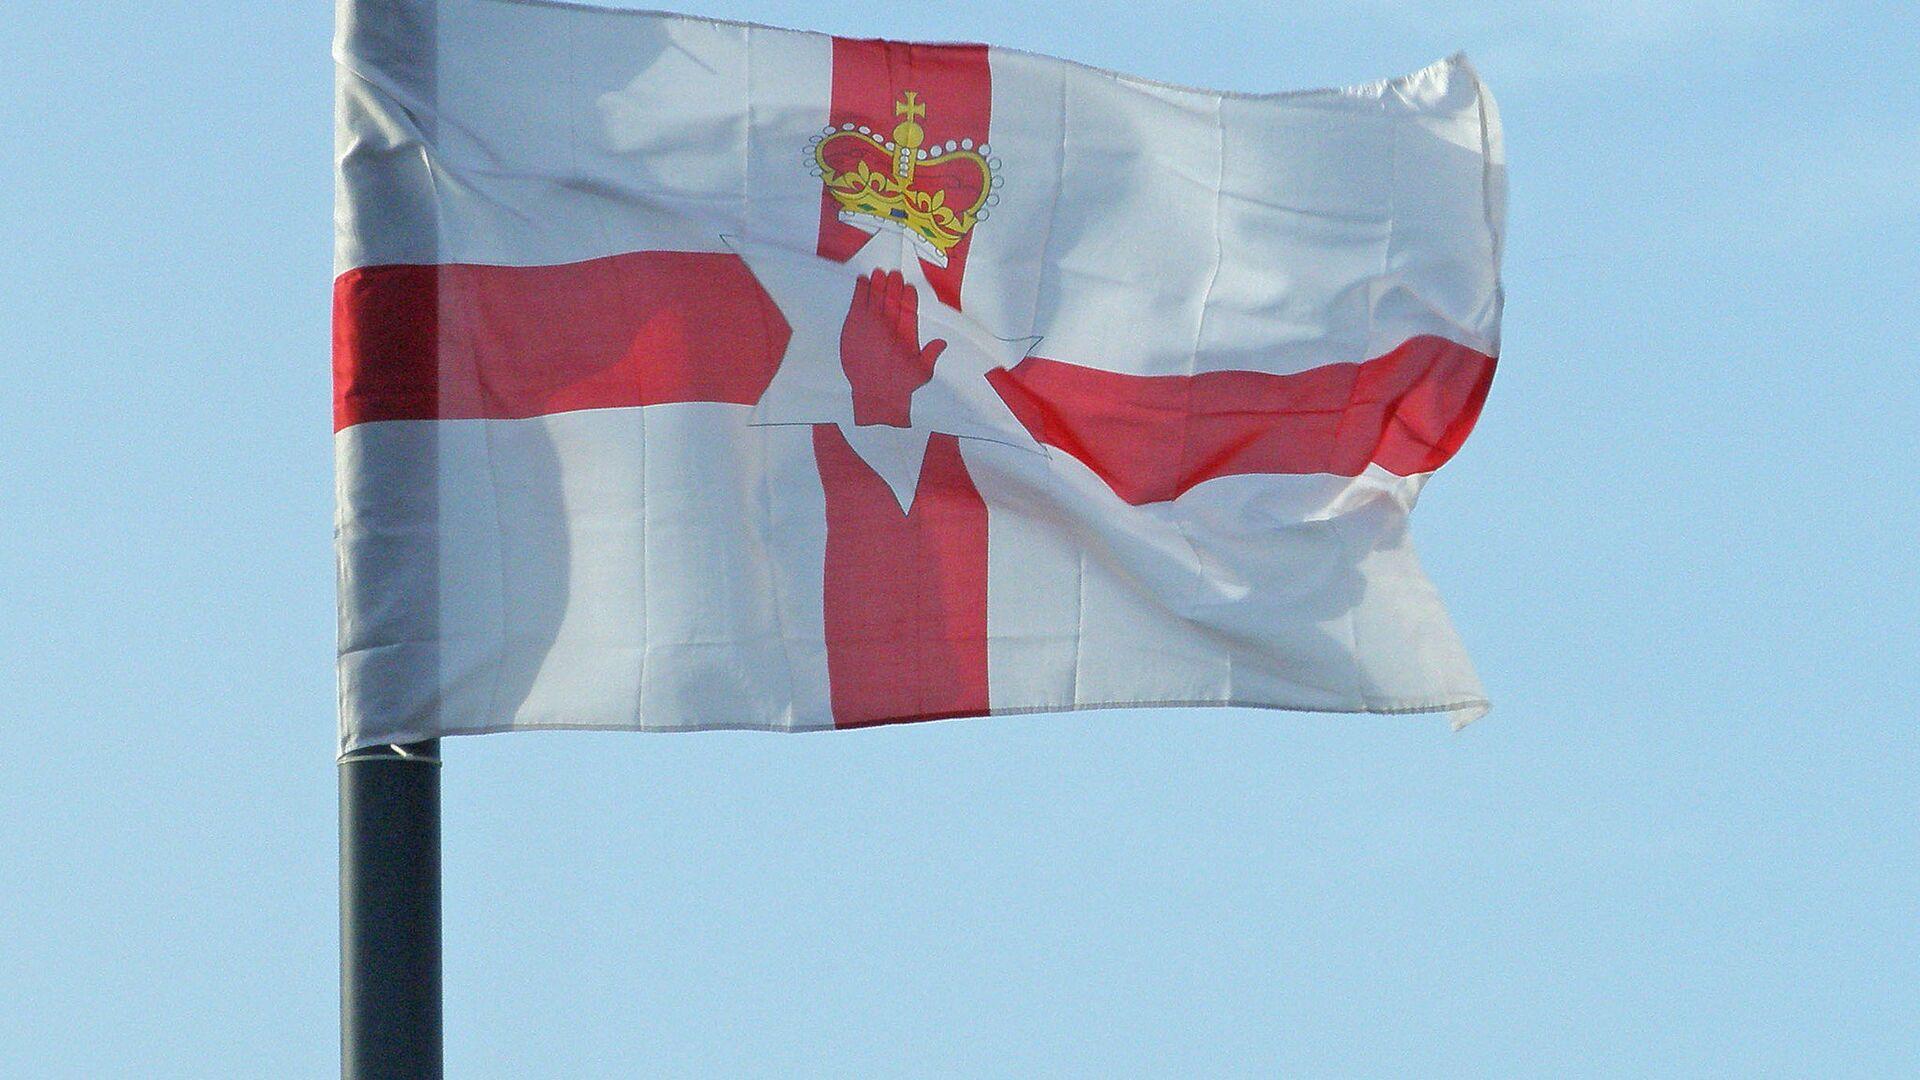 Bandera de Irlanda del Norte - Sputnik Mundo, 1920, 08.10.2021